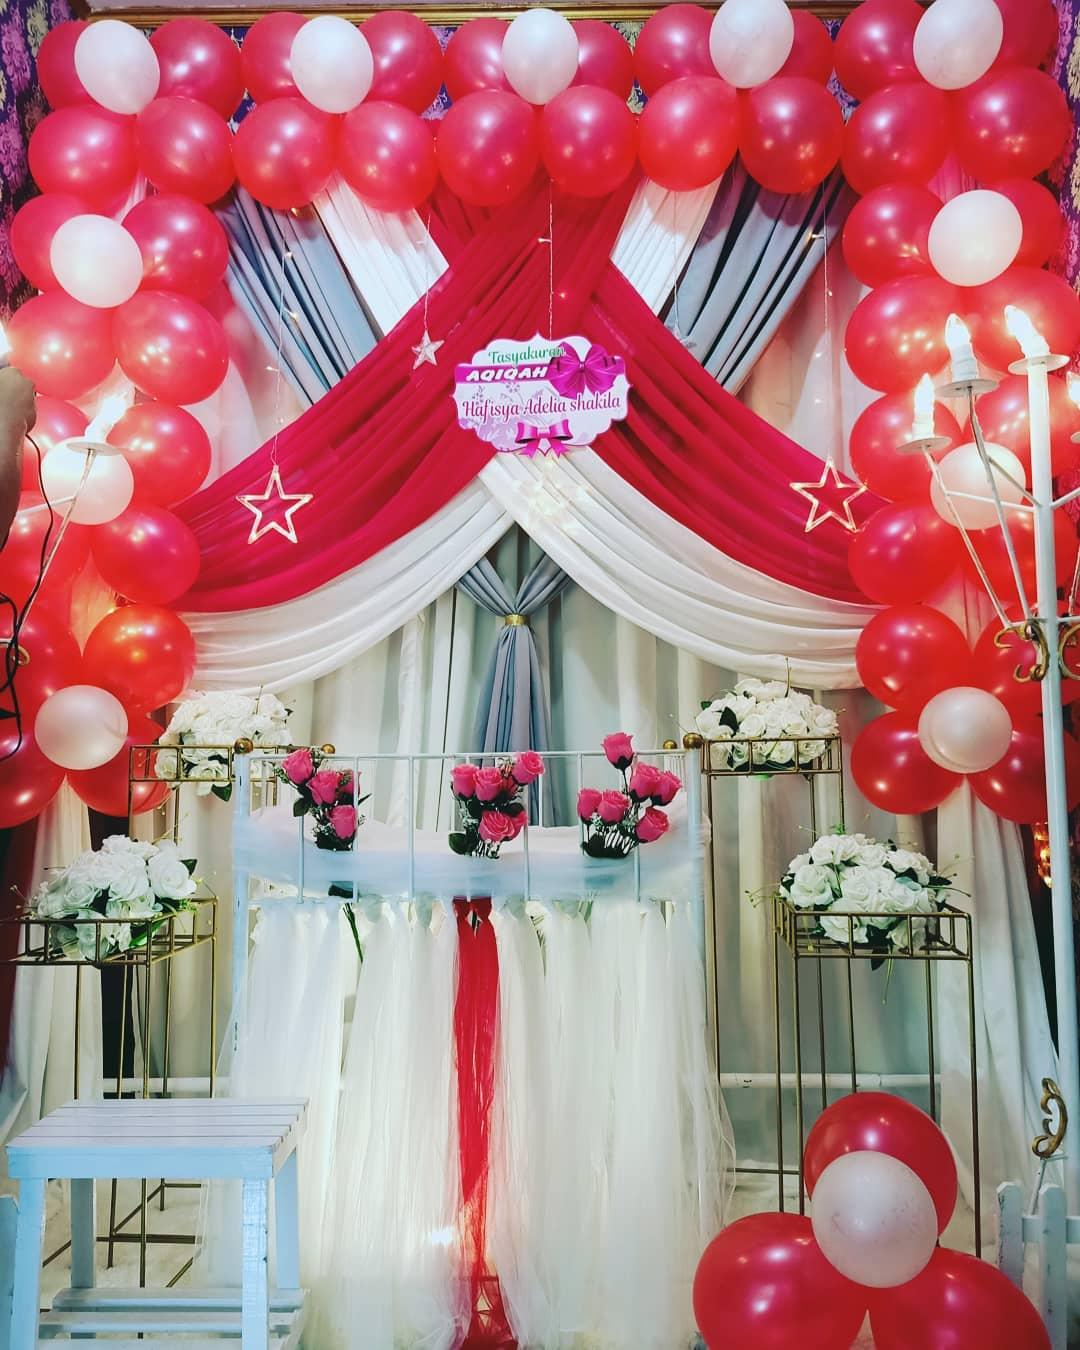 Terima Jasa Rent Kursi Tenda Dekorasi dan Alat Pesta Lengkap Paket Pernikahan Modern Di Daerah Pasir Muncang DISKON 50%